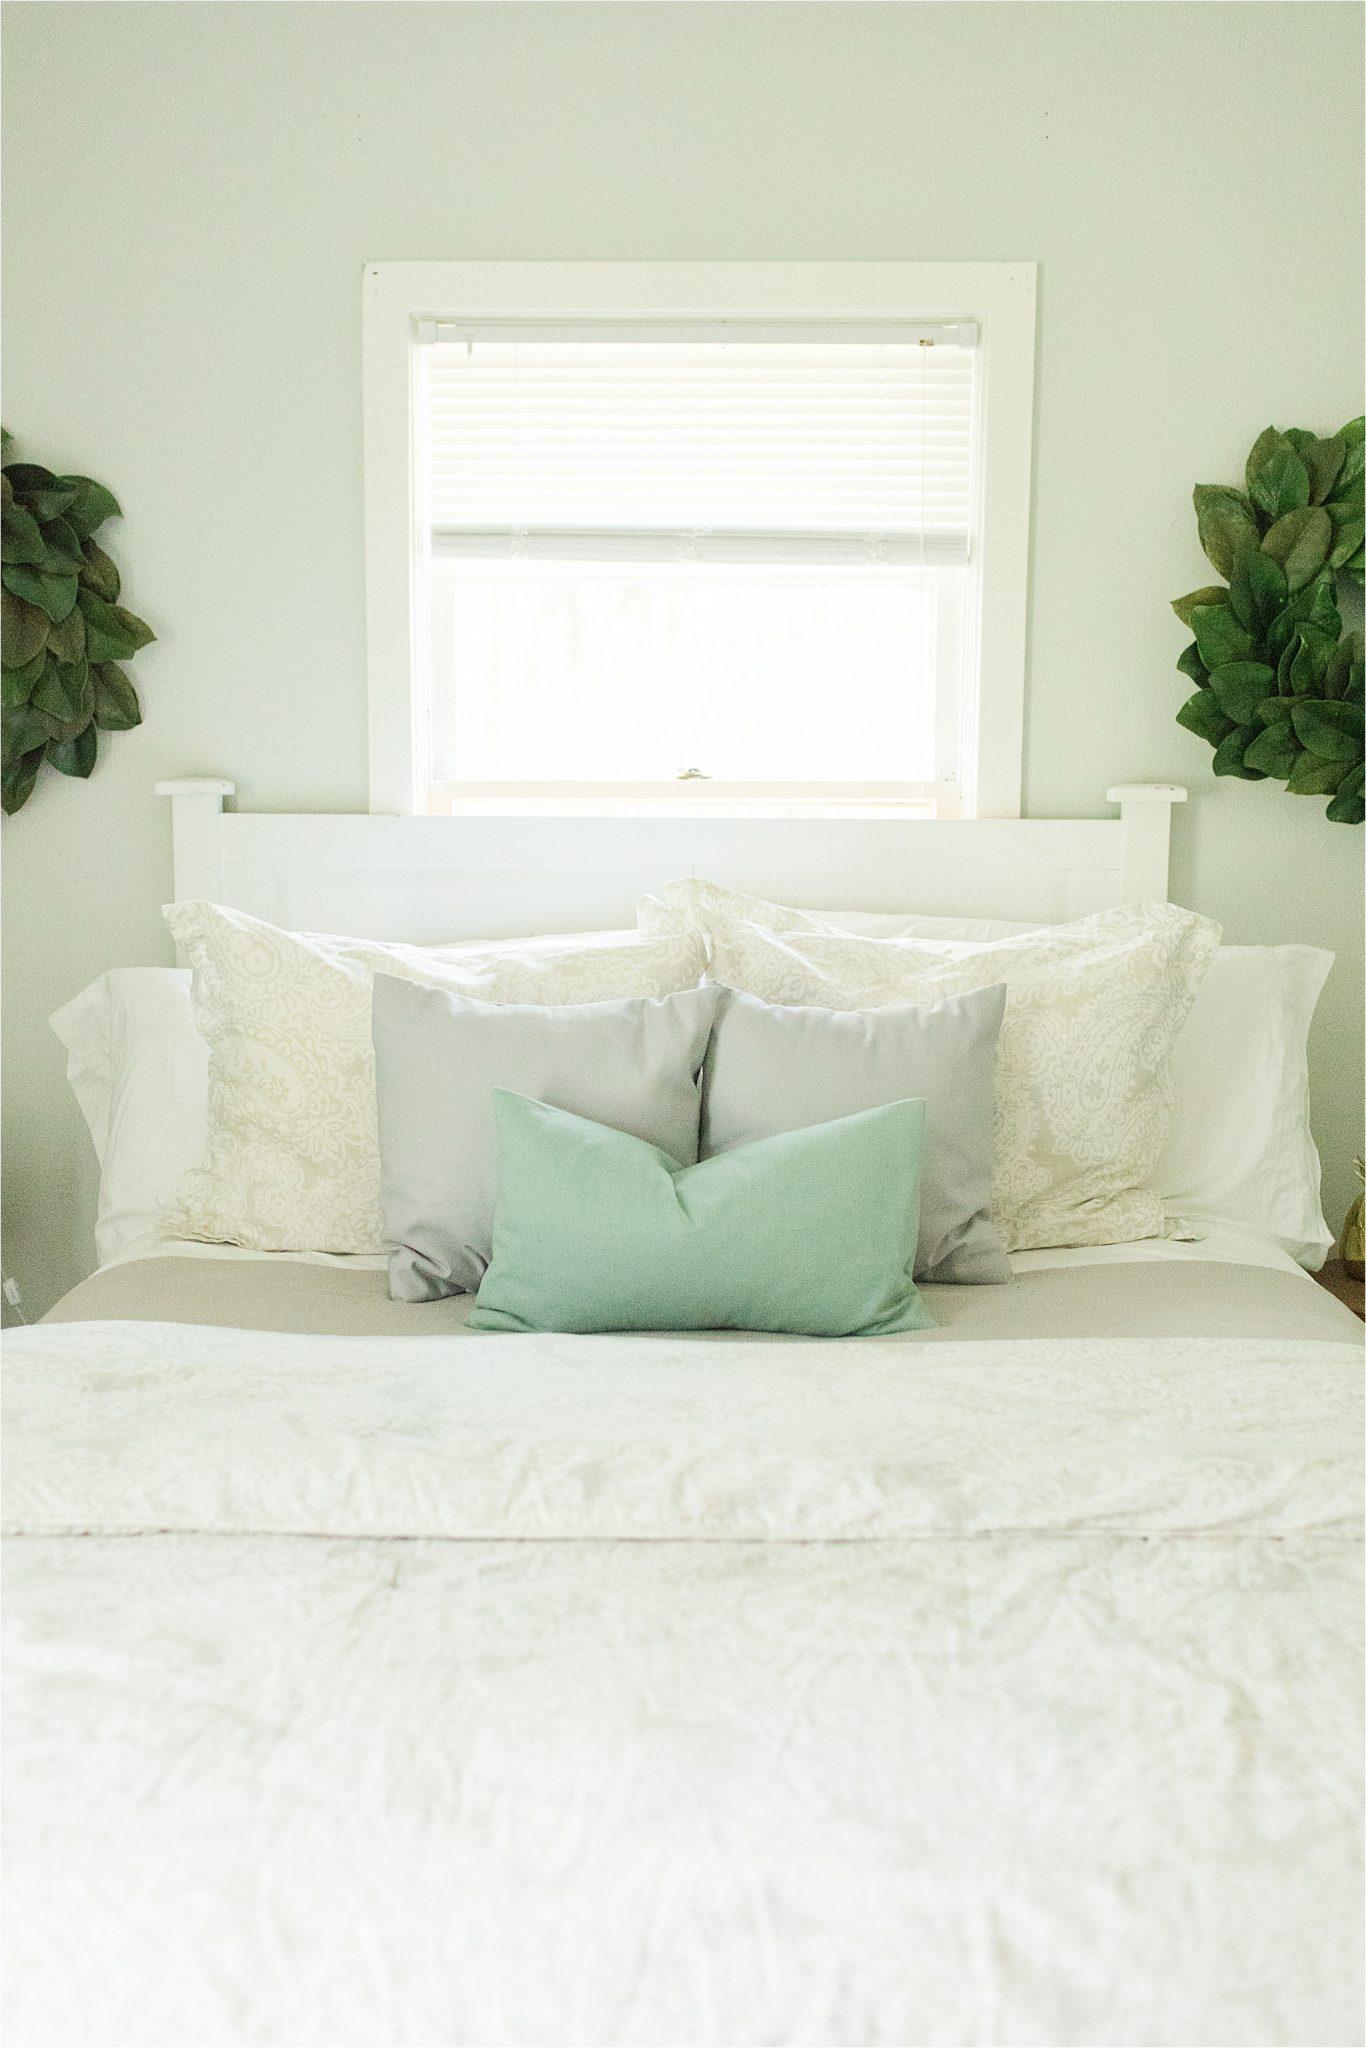 Bedroom ideas, guest bed room, midtown mobile